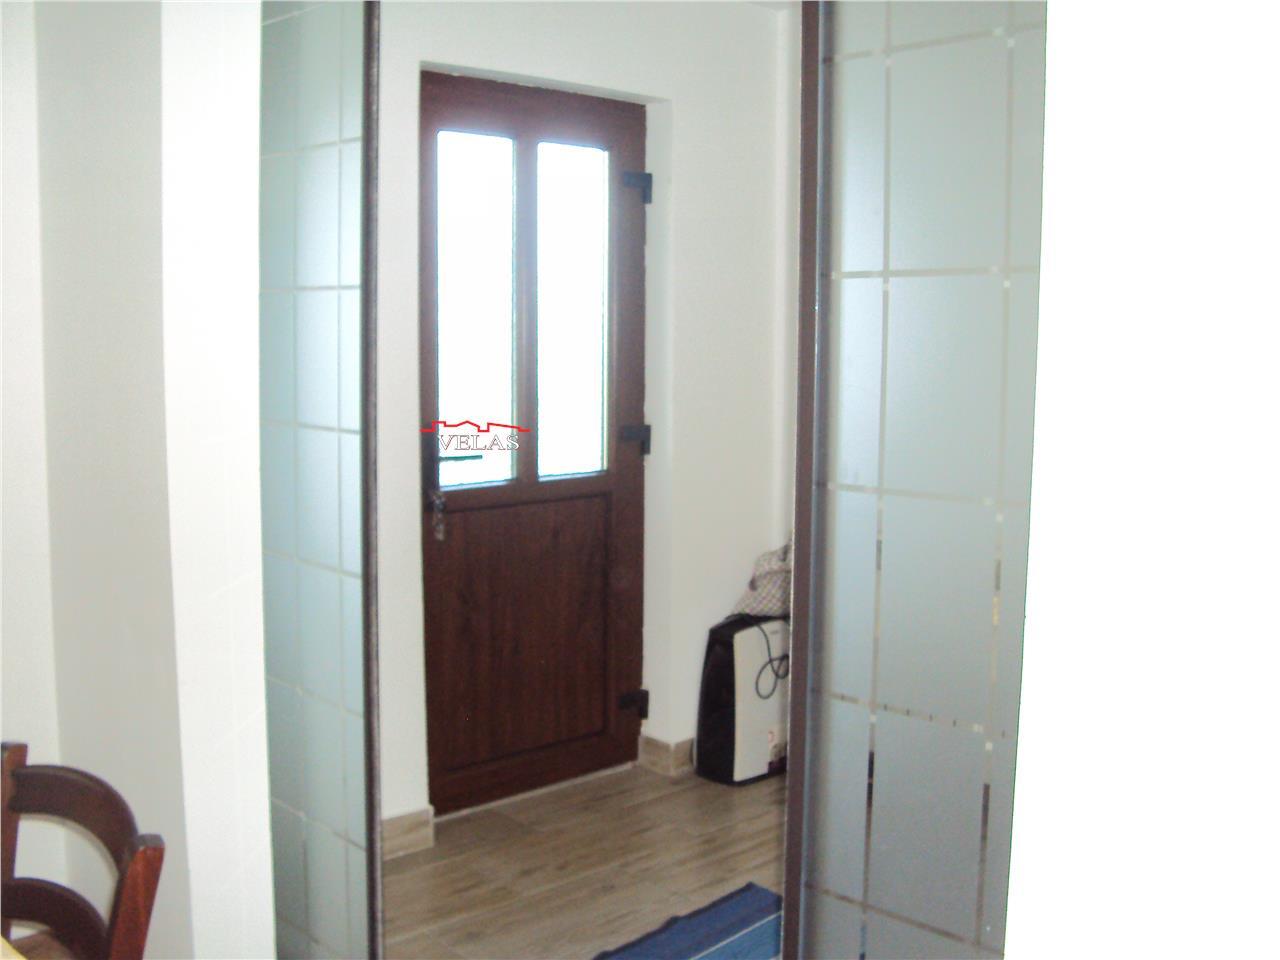 Apartament 4 camere cu extindere, CT, mobilat, fosta Autogara